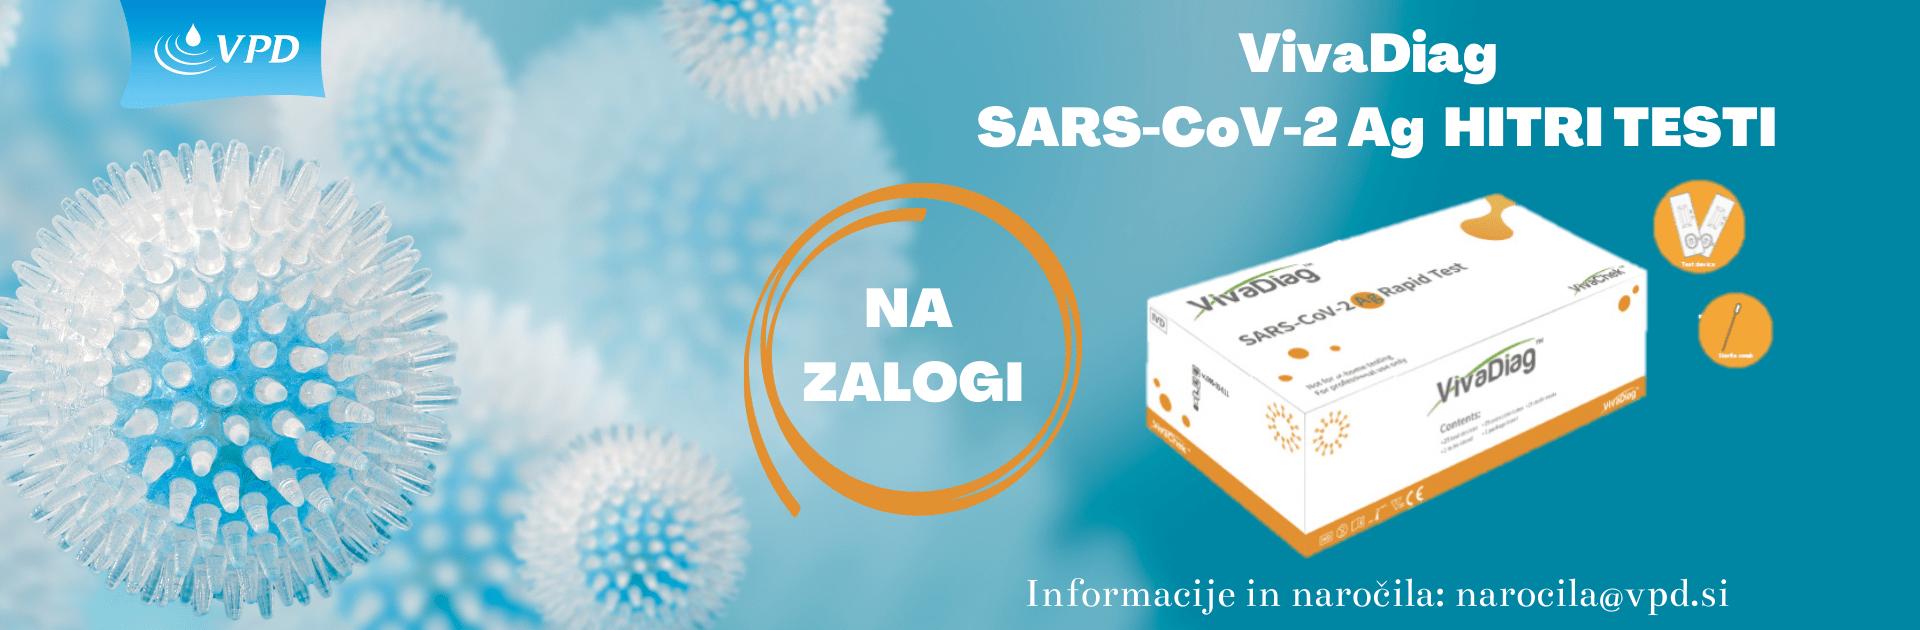 VivaDiag SARS CoV 2 Ag HITRI TESTI 1